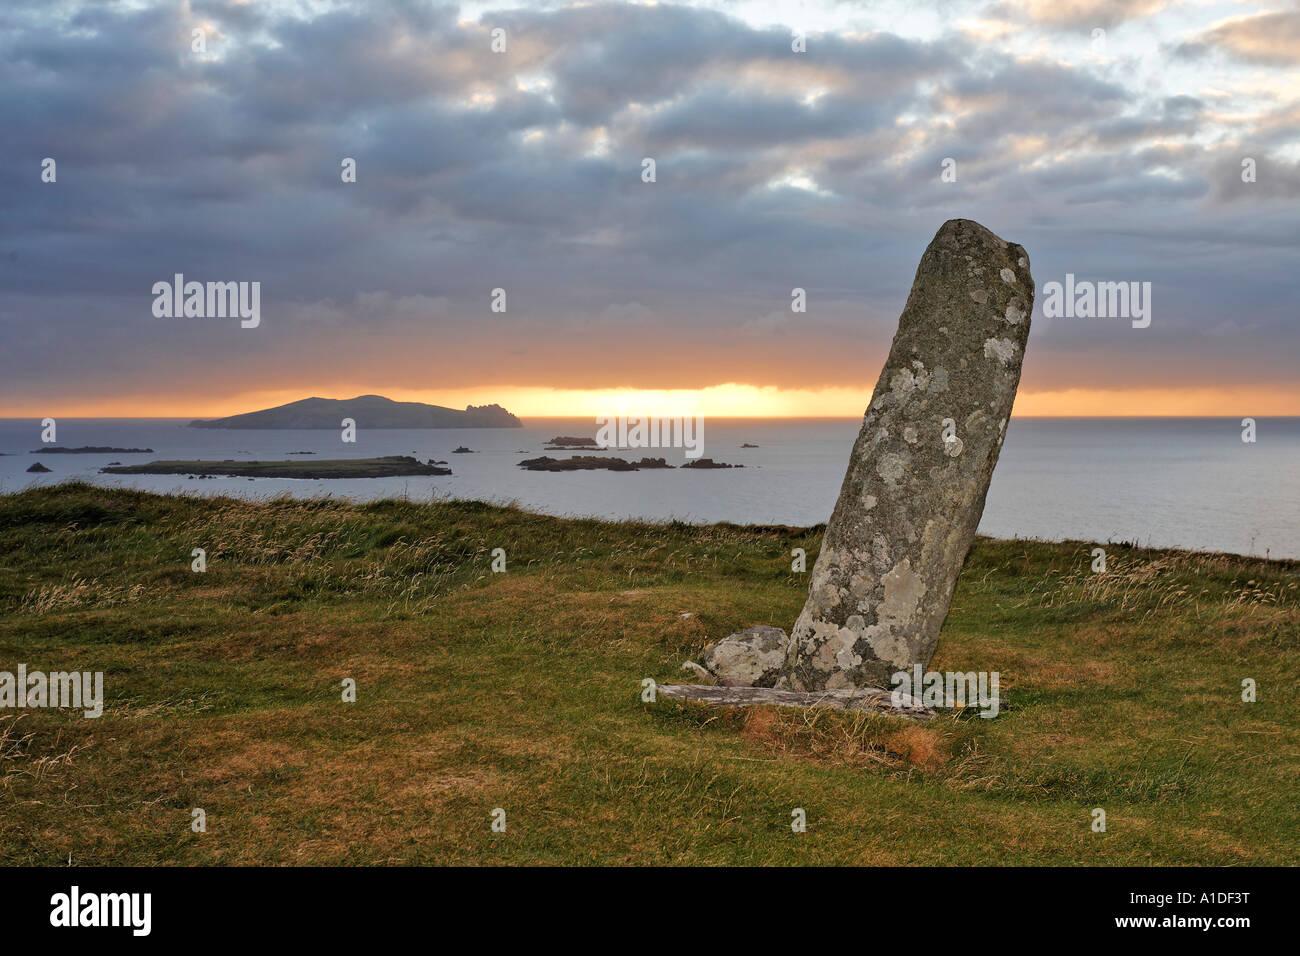 Standing stone bei Sonnenuntergang, Slea Head, Dingle peninsula, Kerry, Ireland - Stock Image